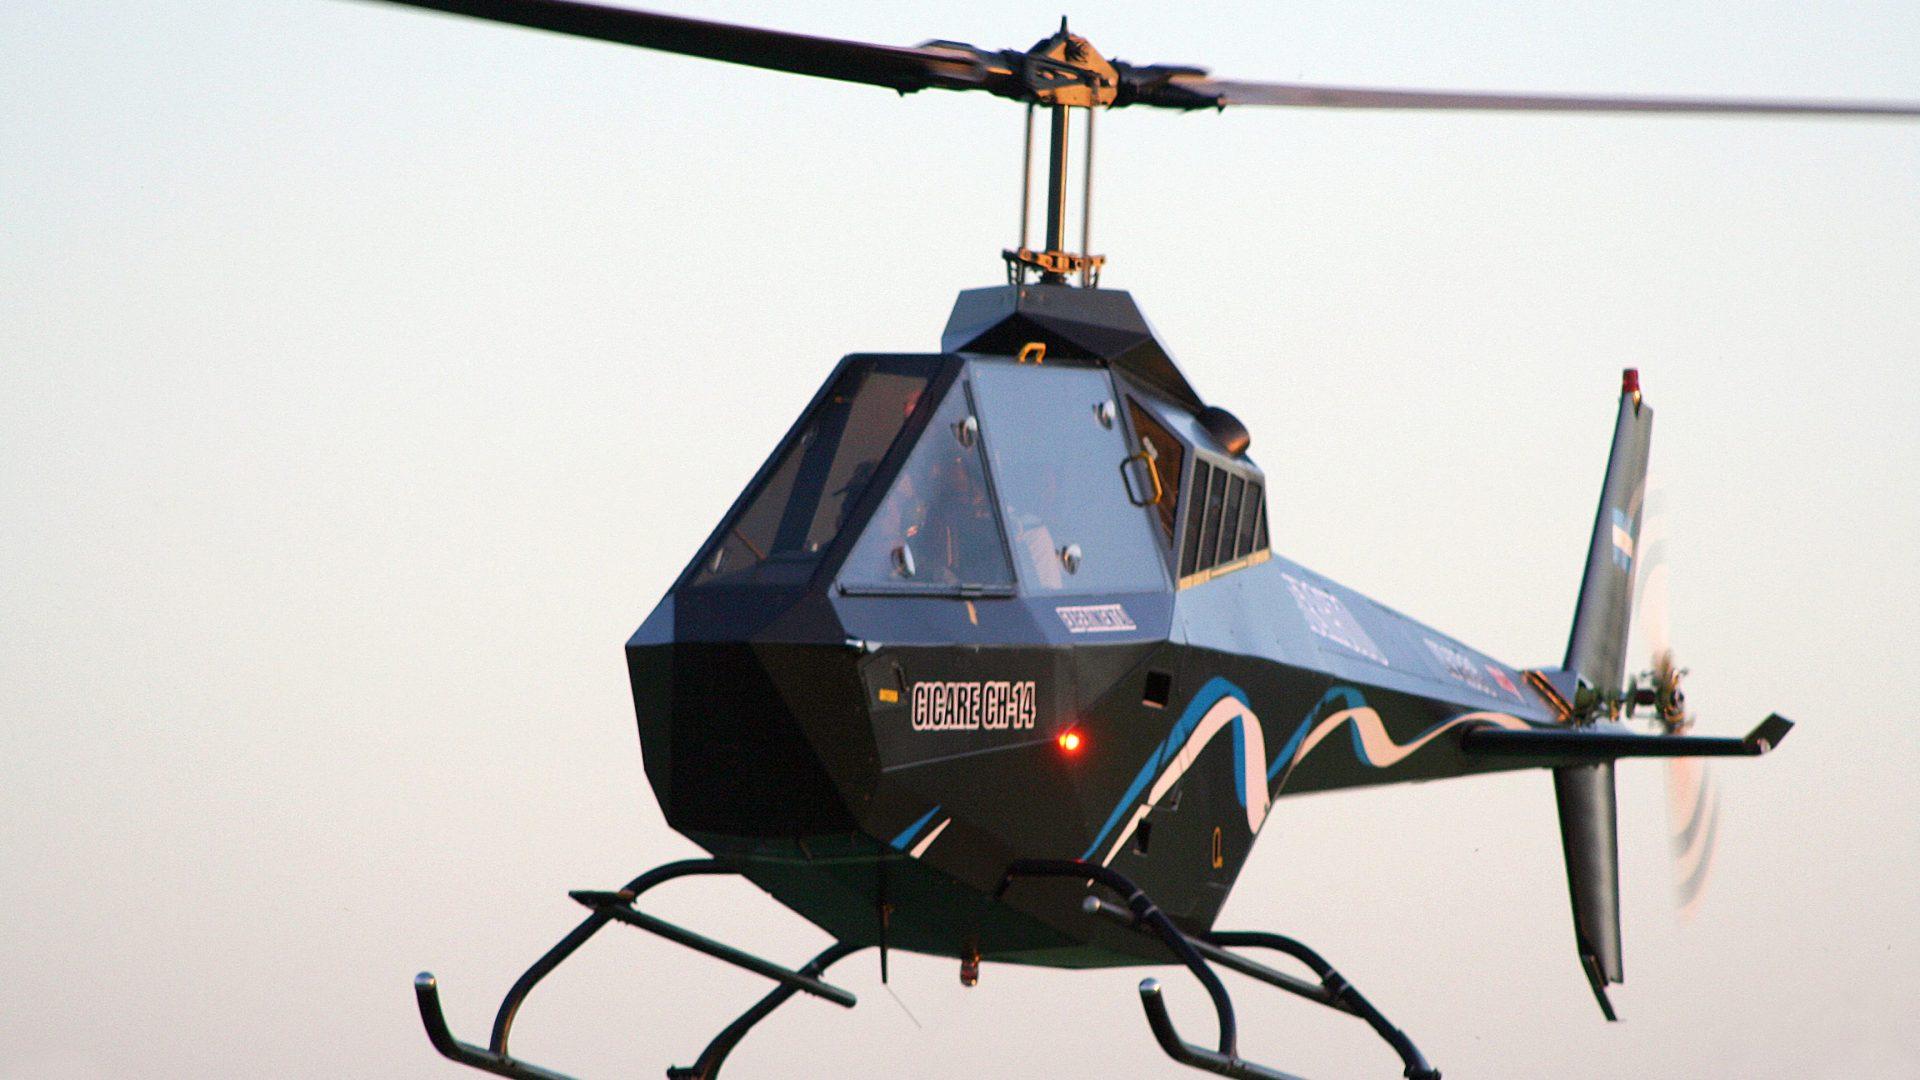 Cicaré CH-14